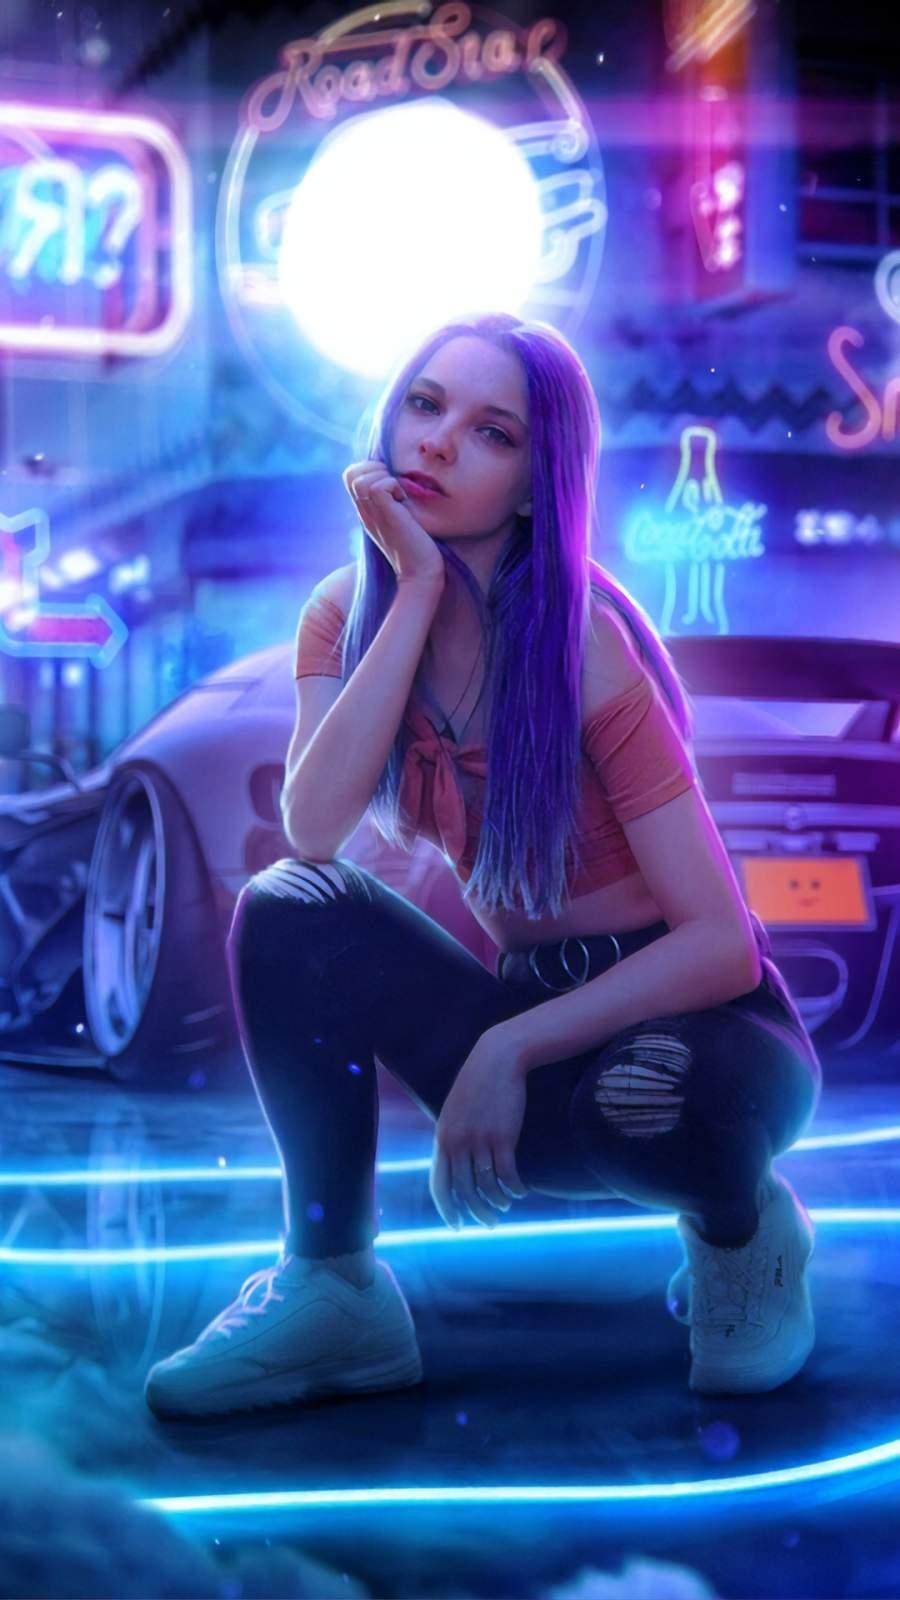 Cyber Girl iPhone Wallpaper